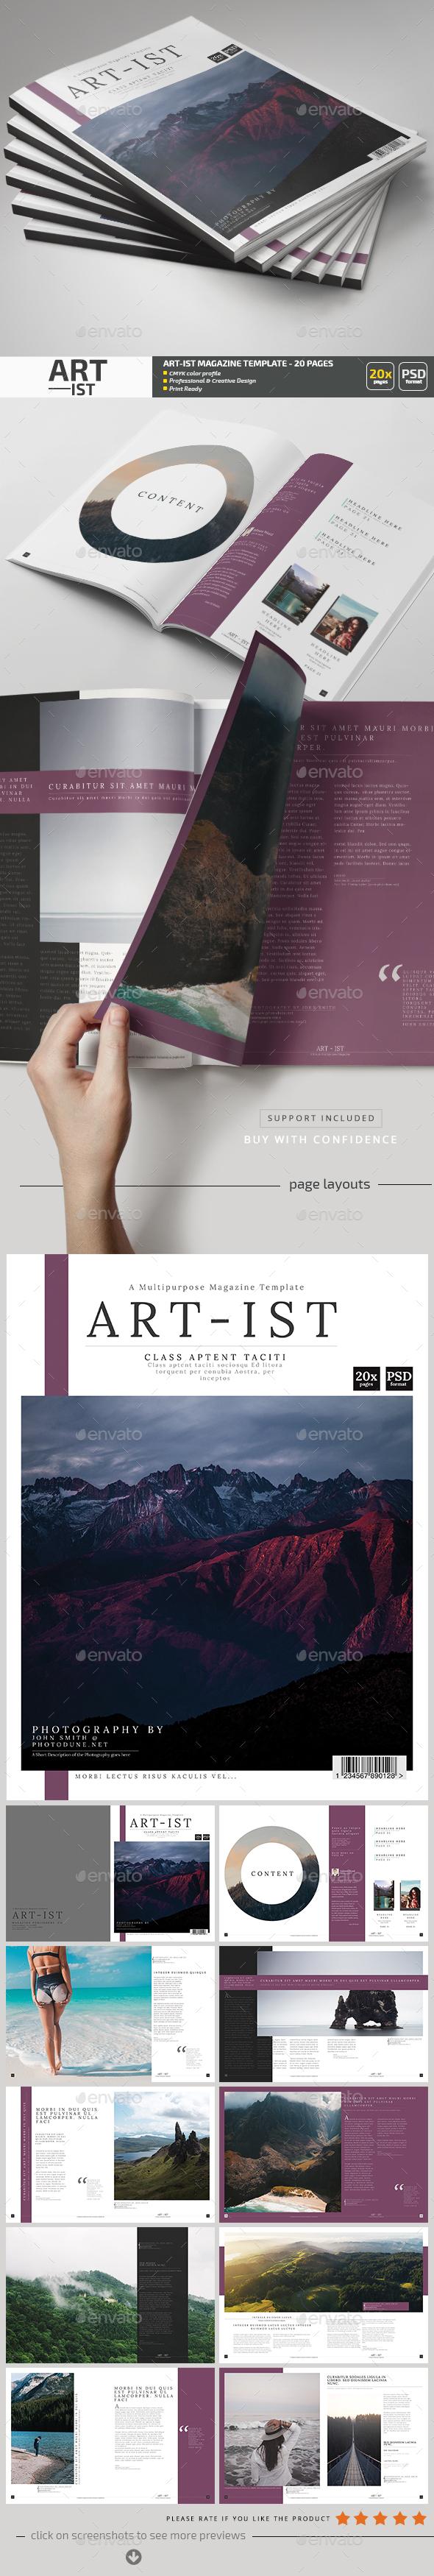 Art-ist Magazine Template V.16 - Magazines Print Templates